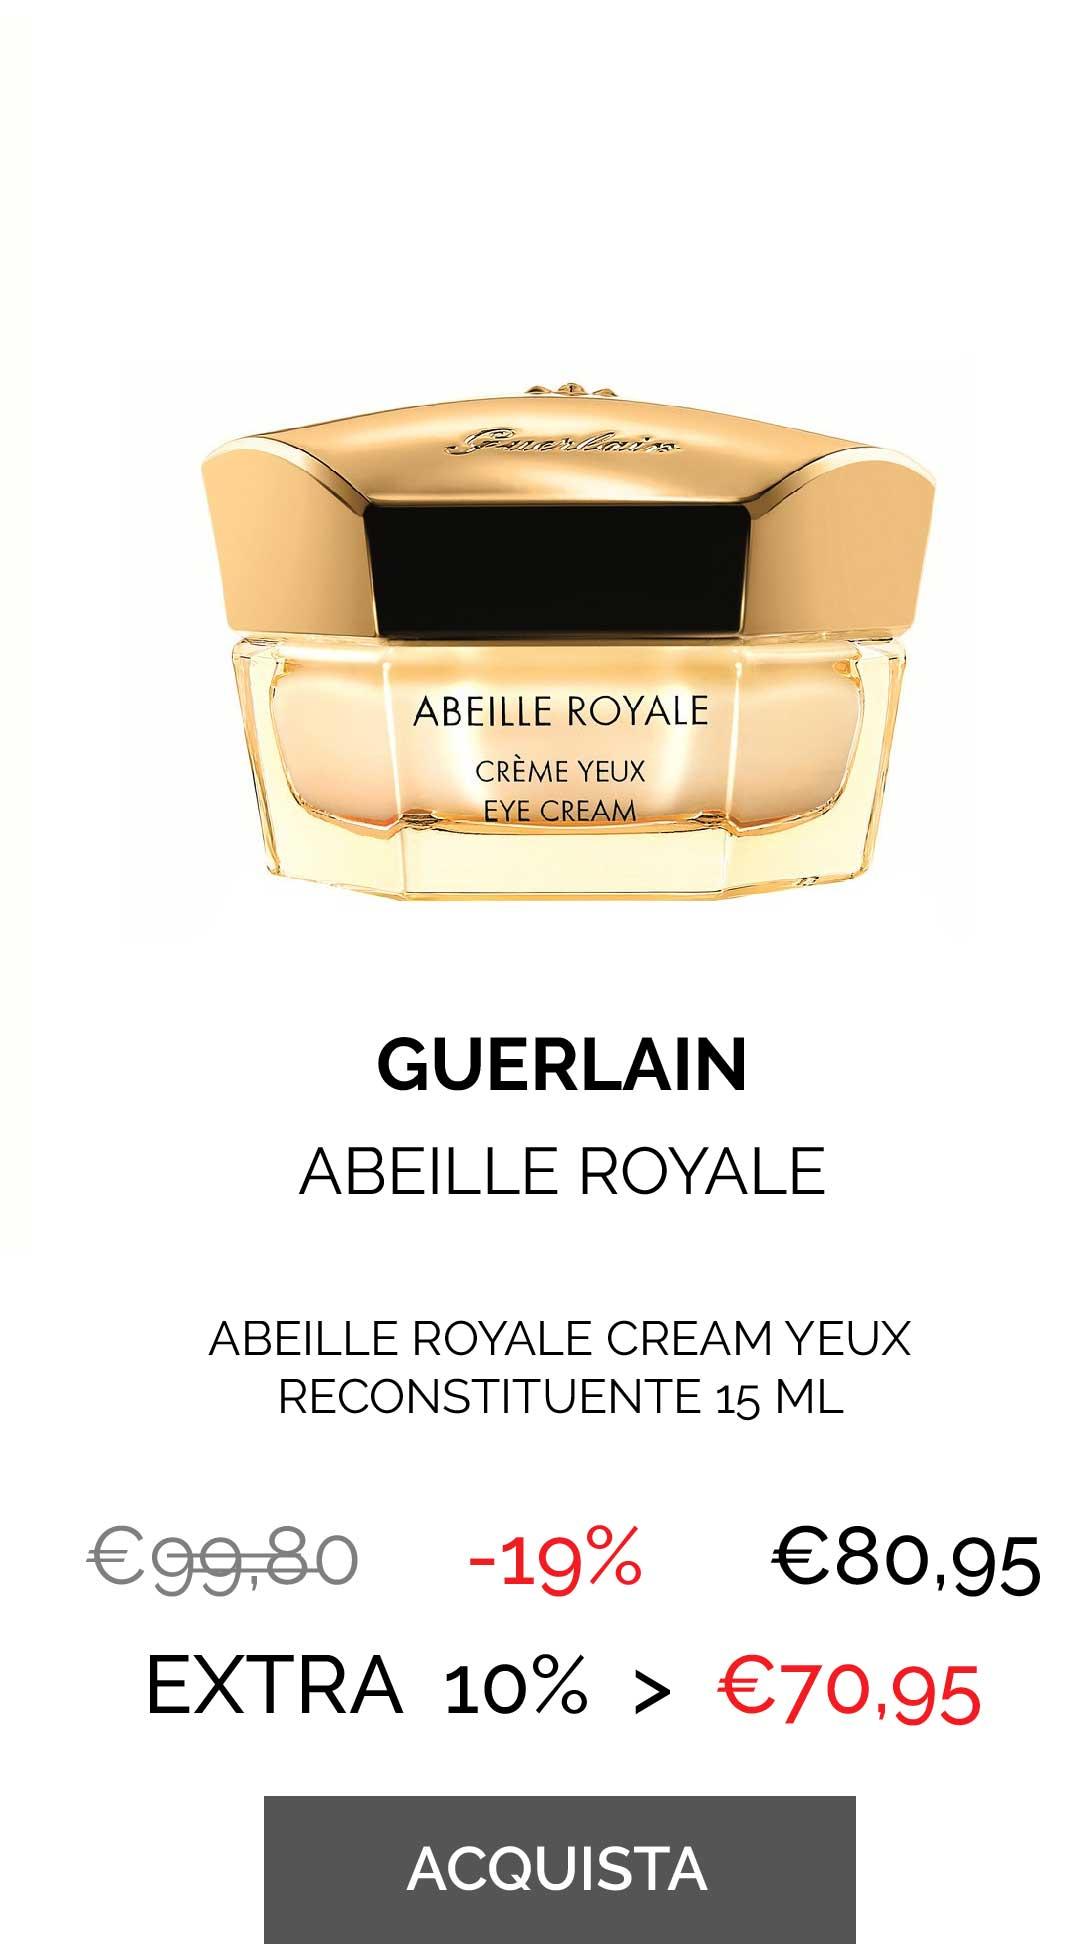 GUERLAIN - AB.ROYAL CREAM YEUX RECONST. 15 ML